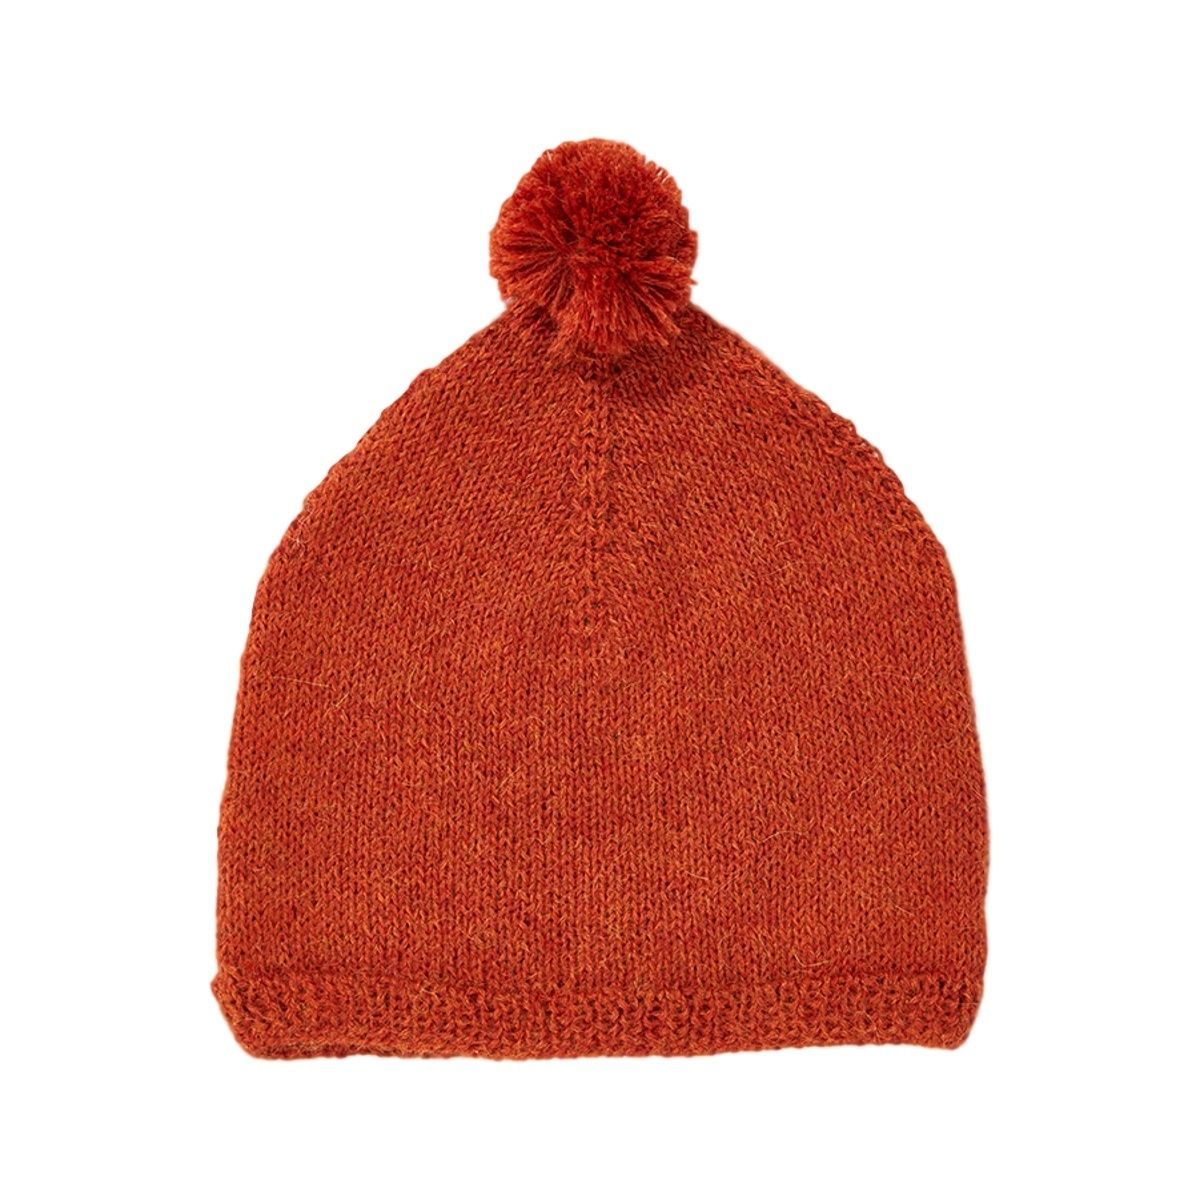 Caramel Baby & Child - Agon Child Hat orange - 1